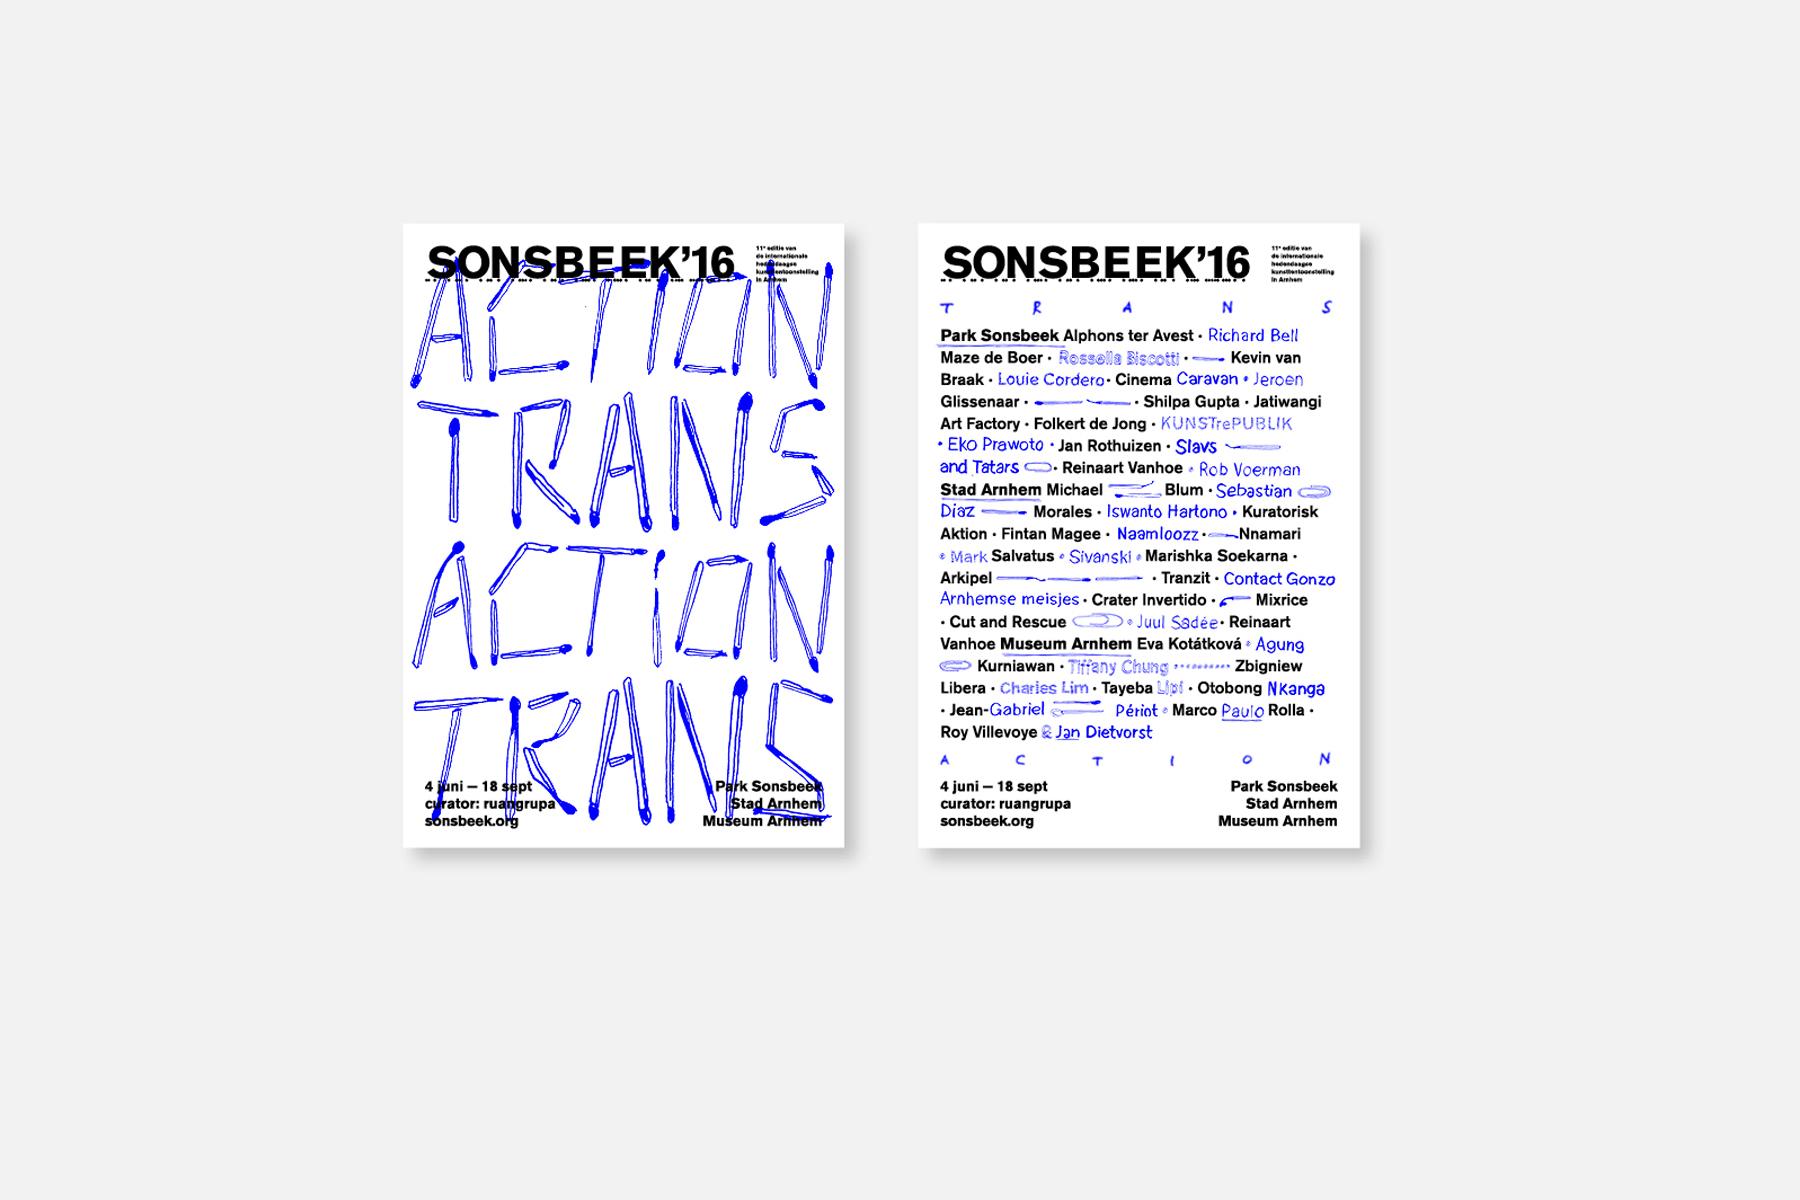 JAN ROTHUIZEN-Sonsbeek'16 TransAction